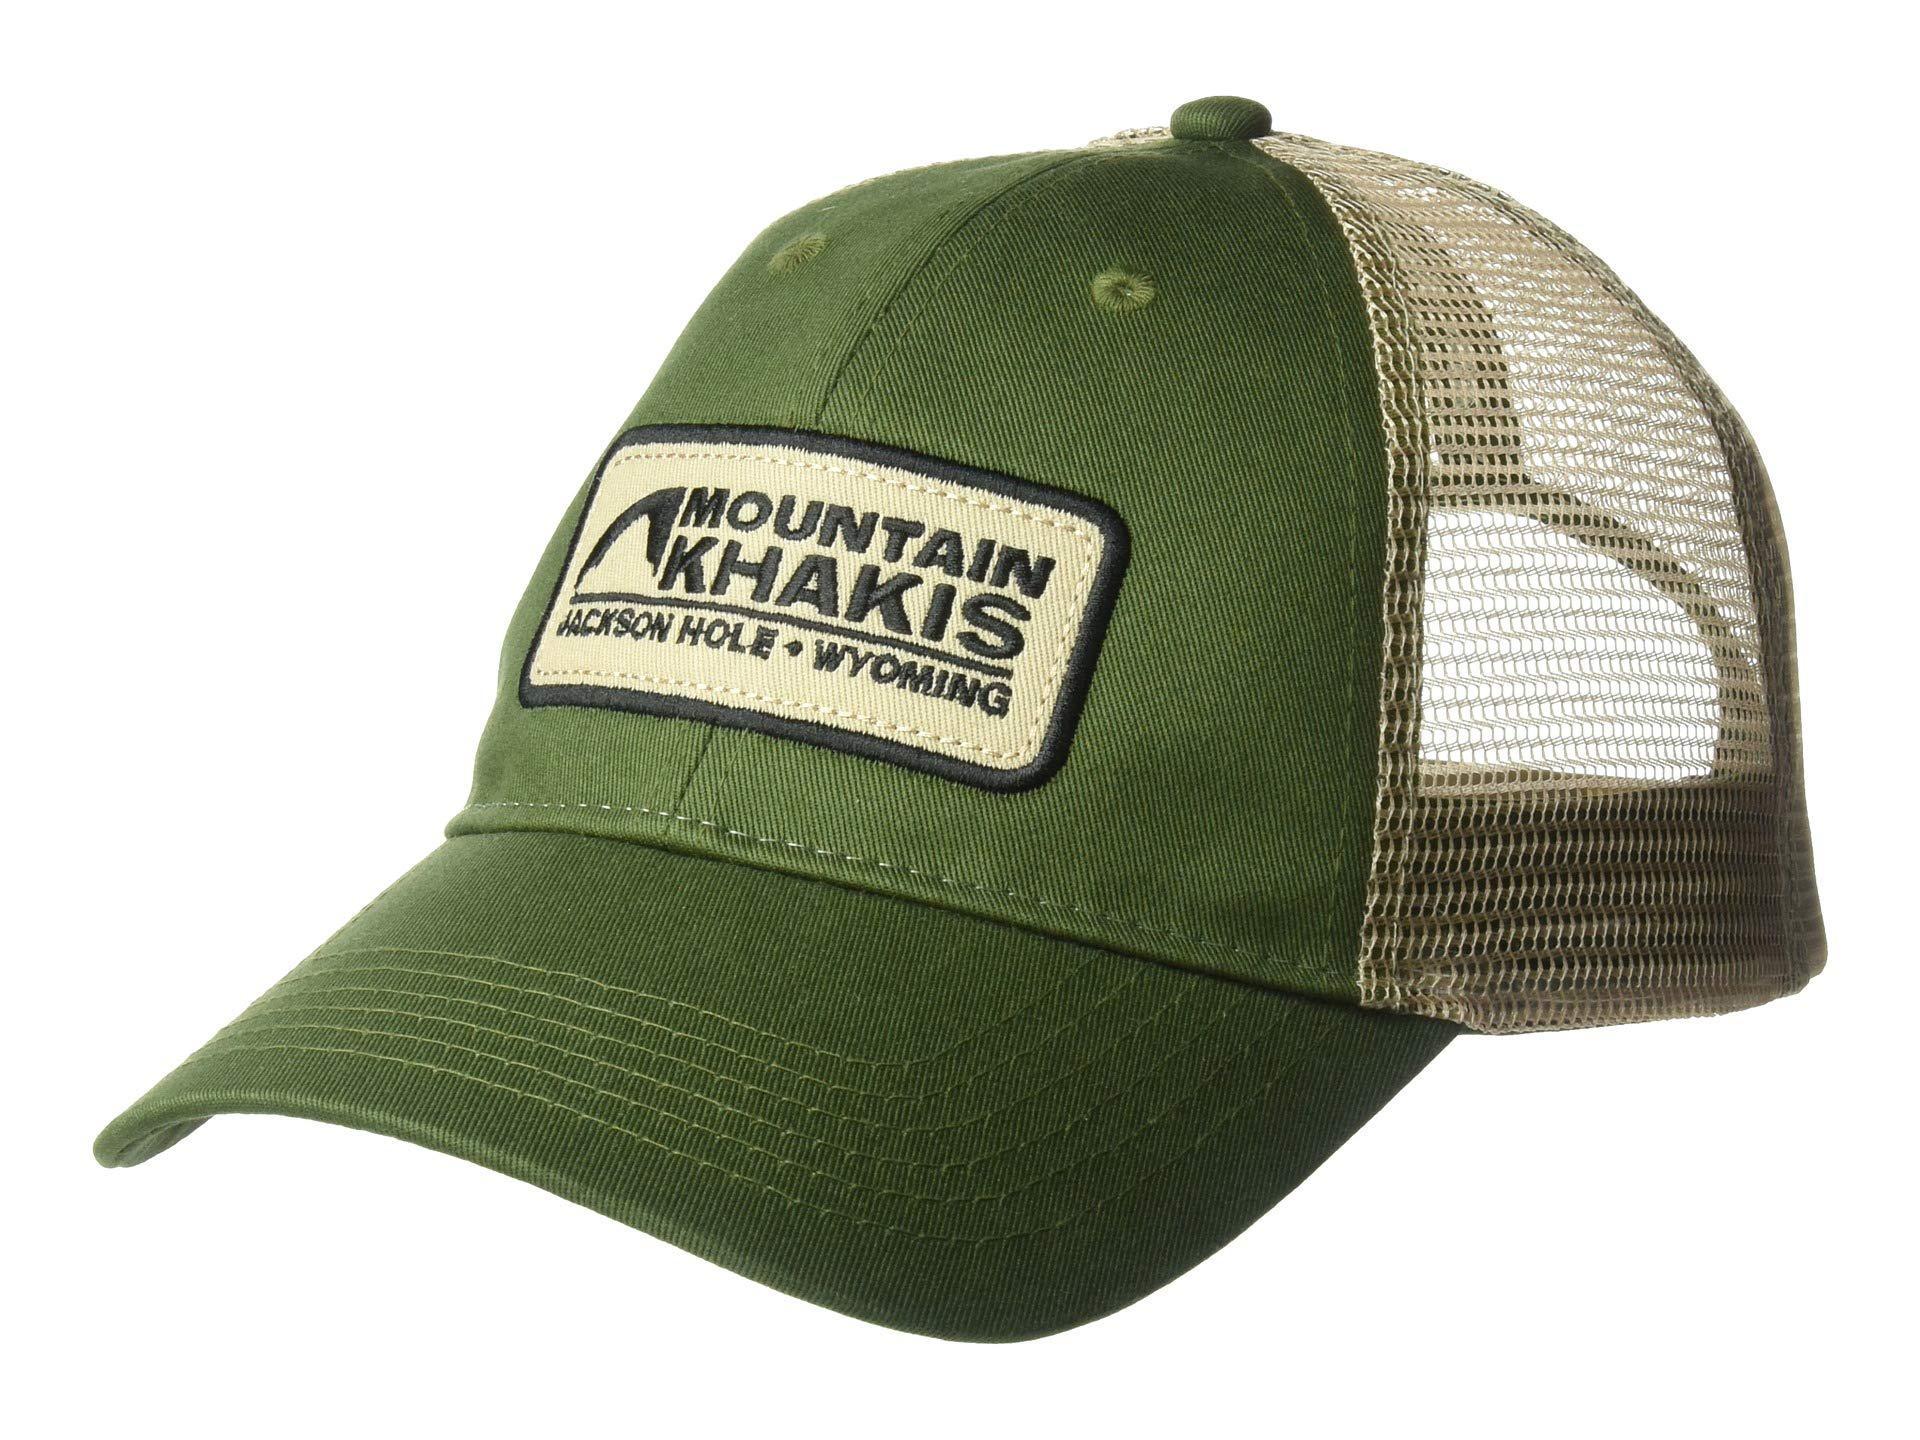 143289f7a0a Lyst - Mountain Khakis Soul Patch Trucker Cap (indigo) Caps in Green ...